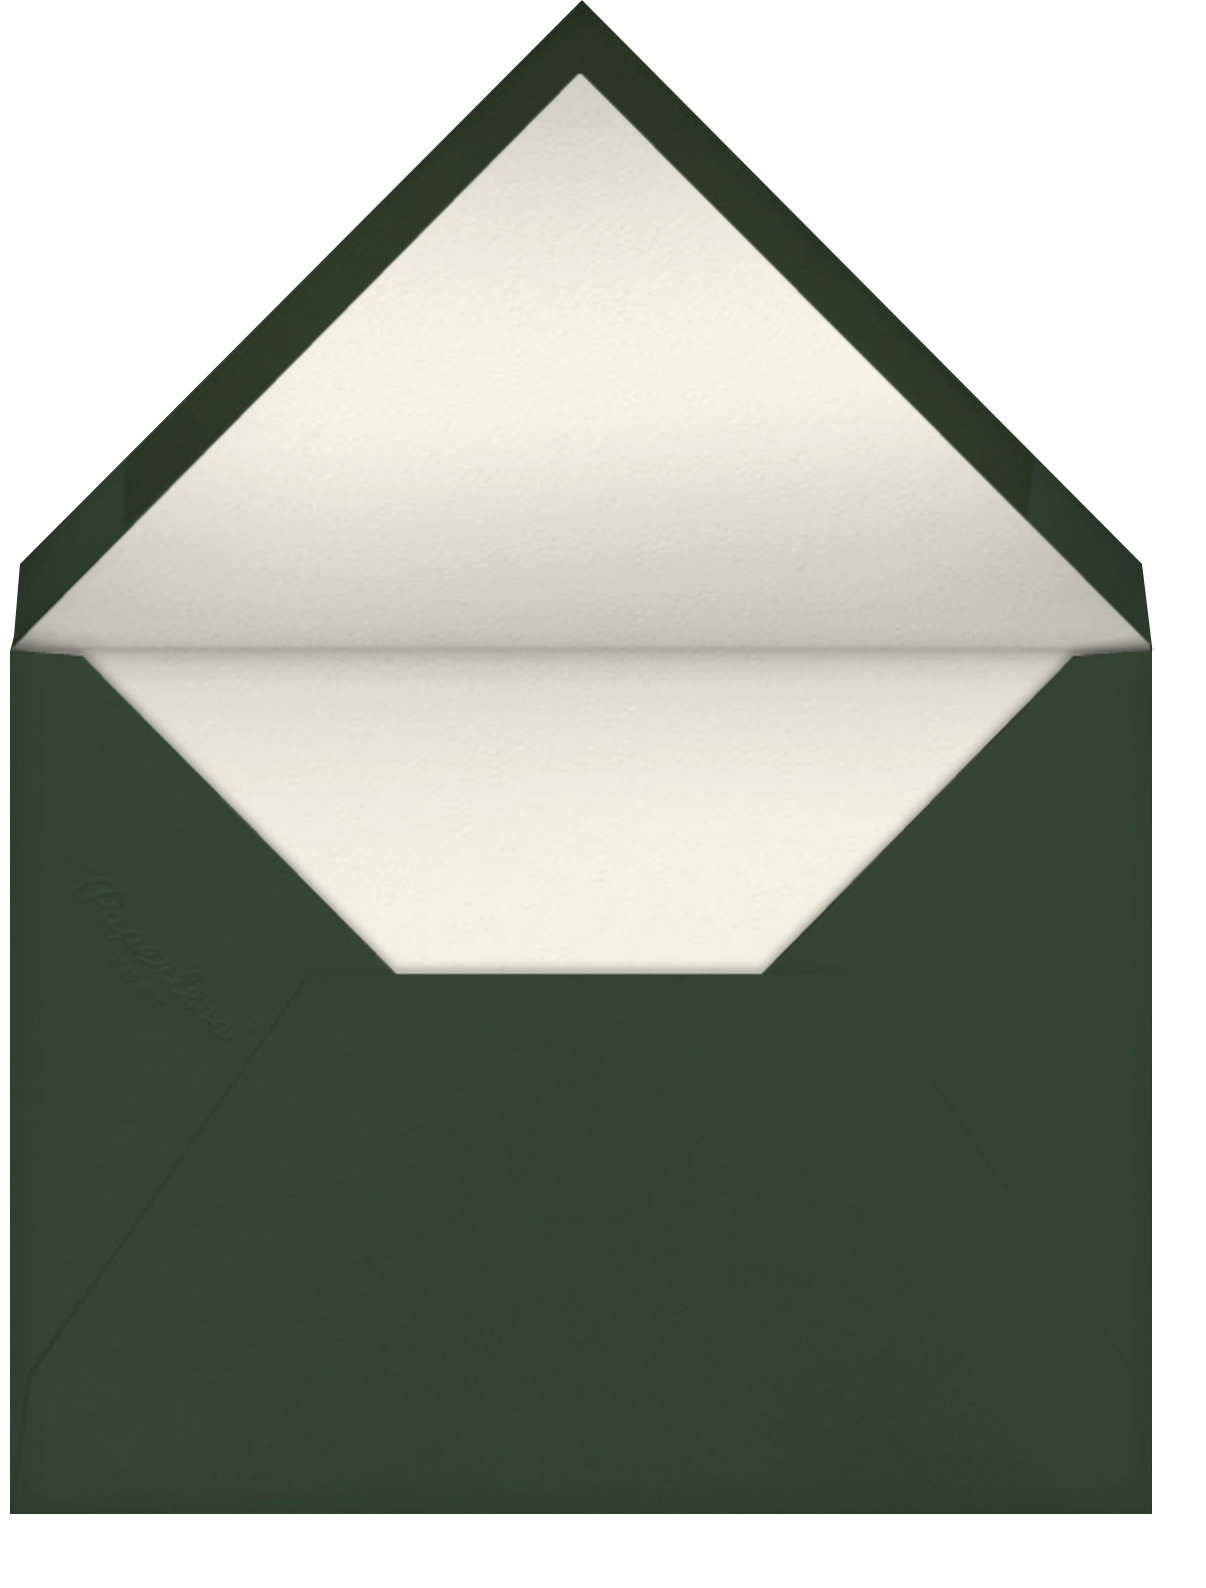 Bambino - Pavlova - Venamour - Sip and see - envelope back